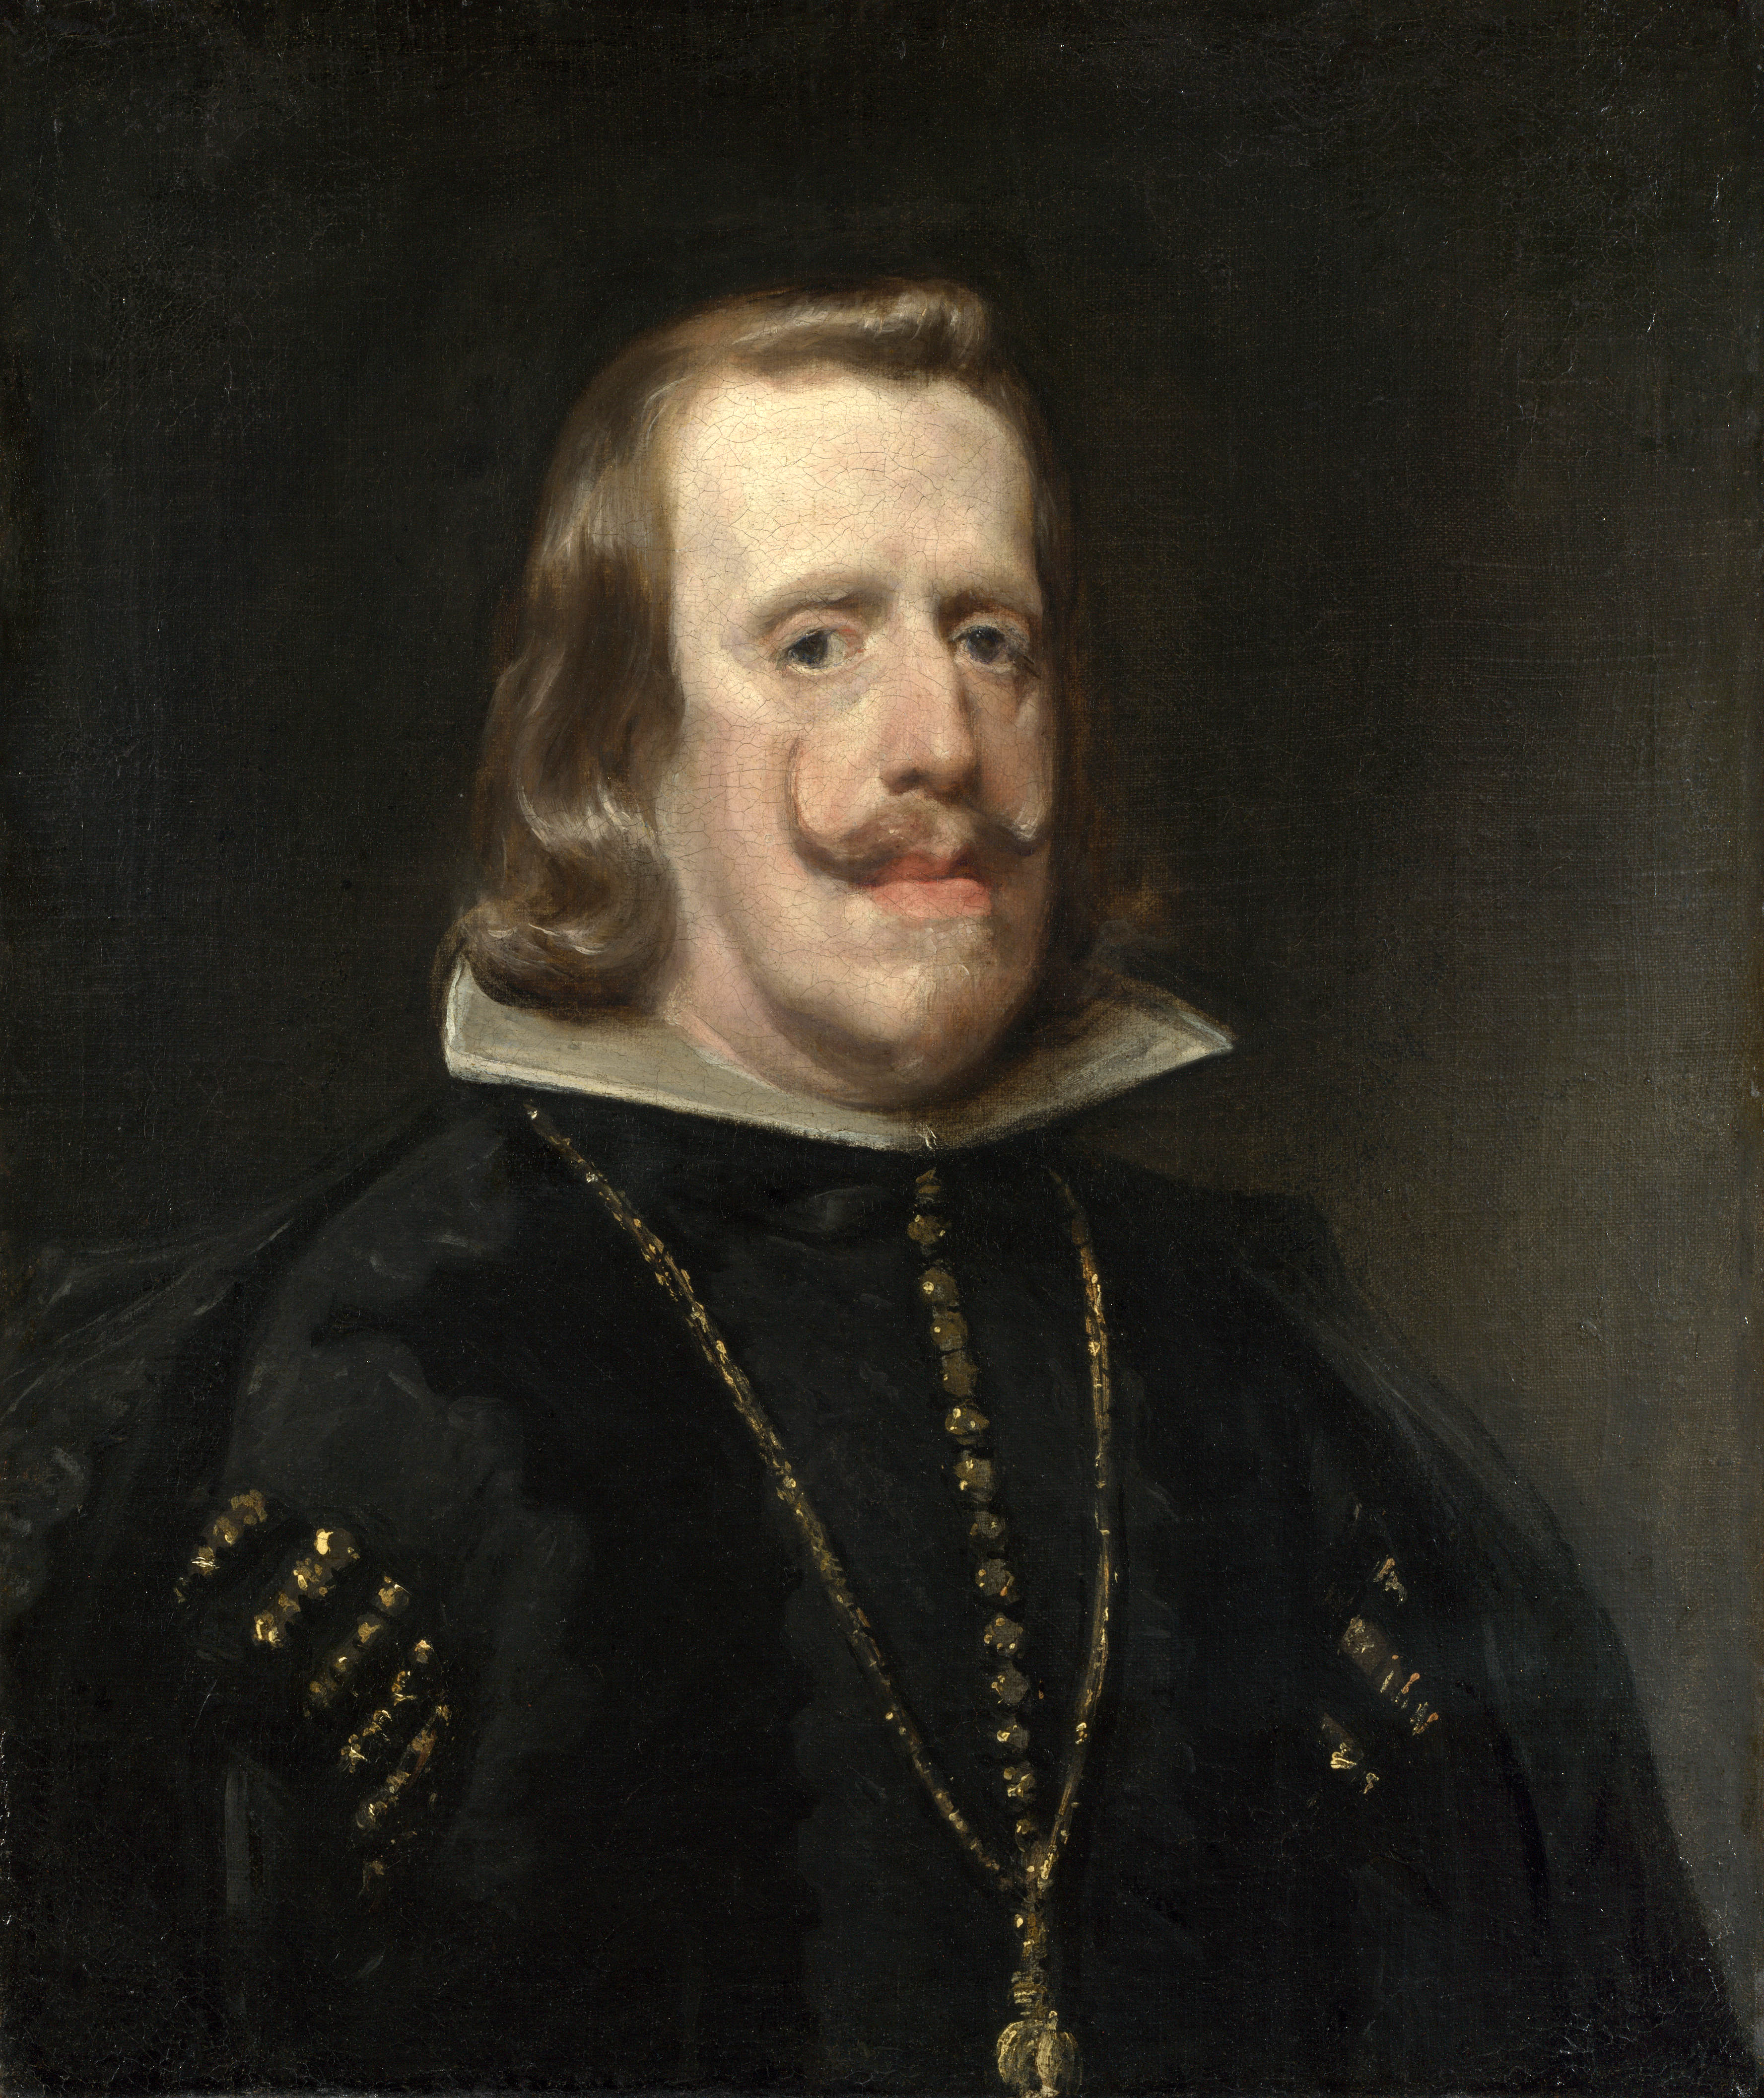 Felipe Iv De Espana Wikipedia La Enciclopedia Libre